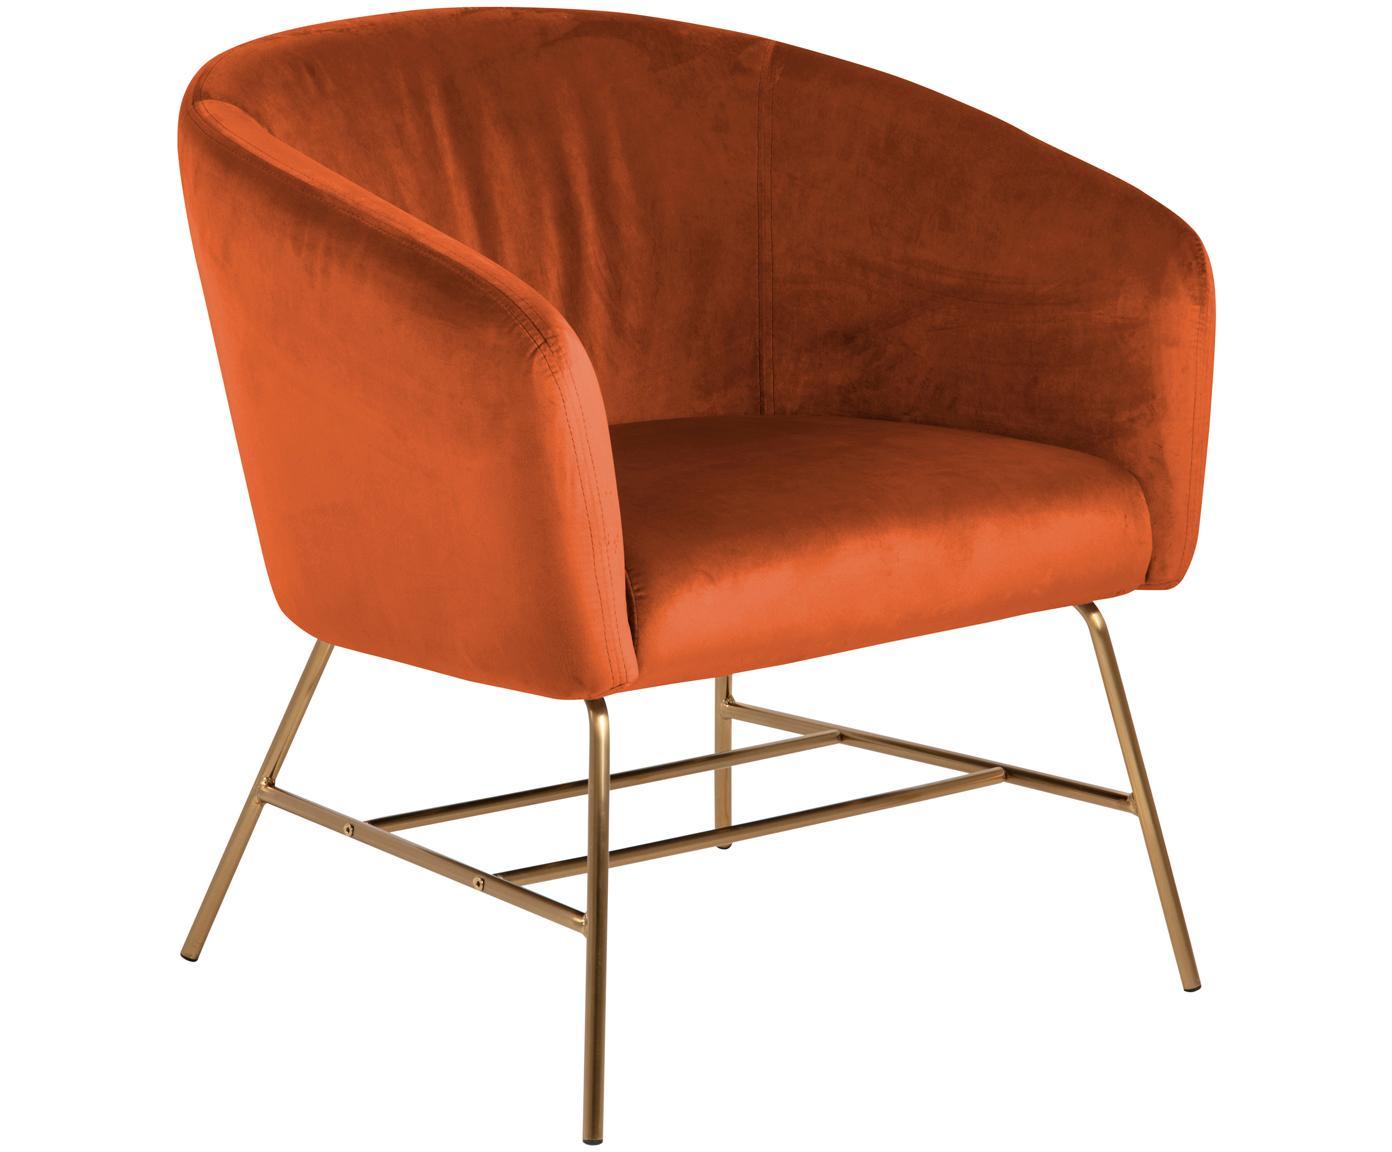 Moderne fluwelen fauteuil Ramsey in koperkleurig, Bekleding: polyester fluweel, Poten: gelakt metaal, Koperkleurig, B 72 x D 67 cm